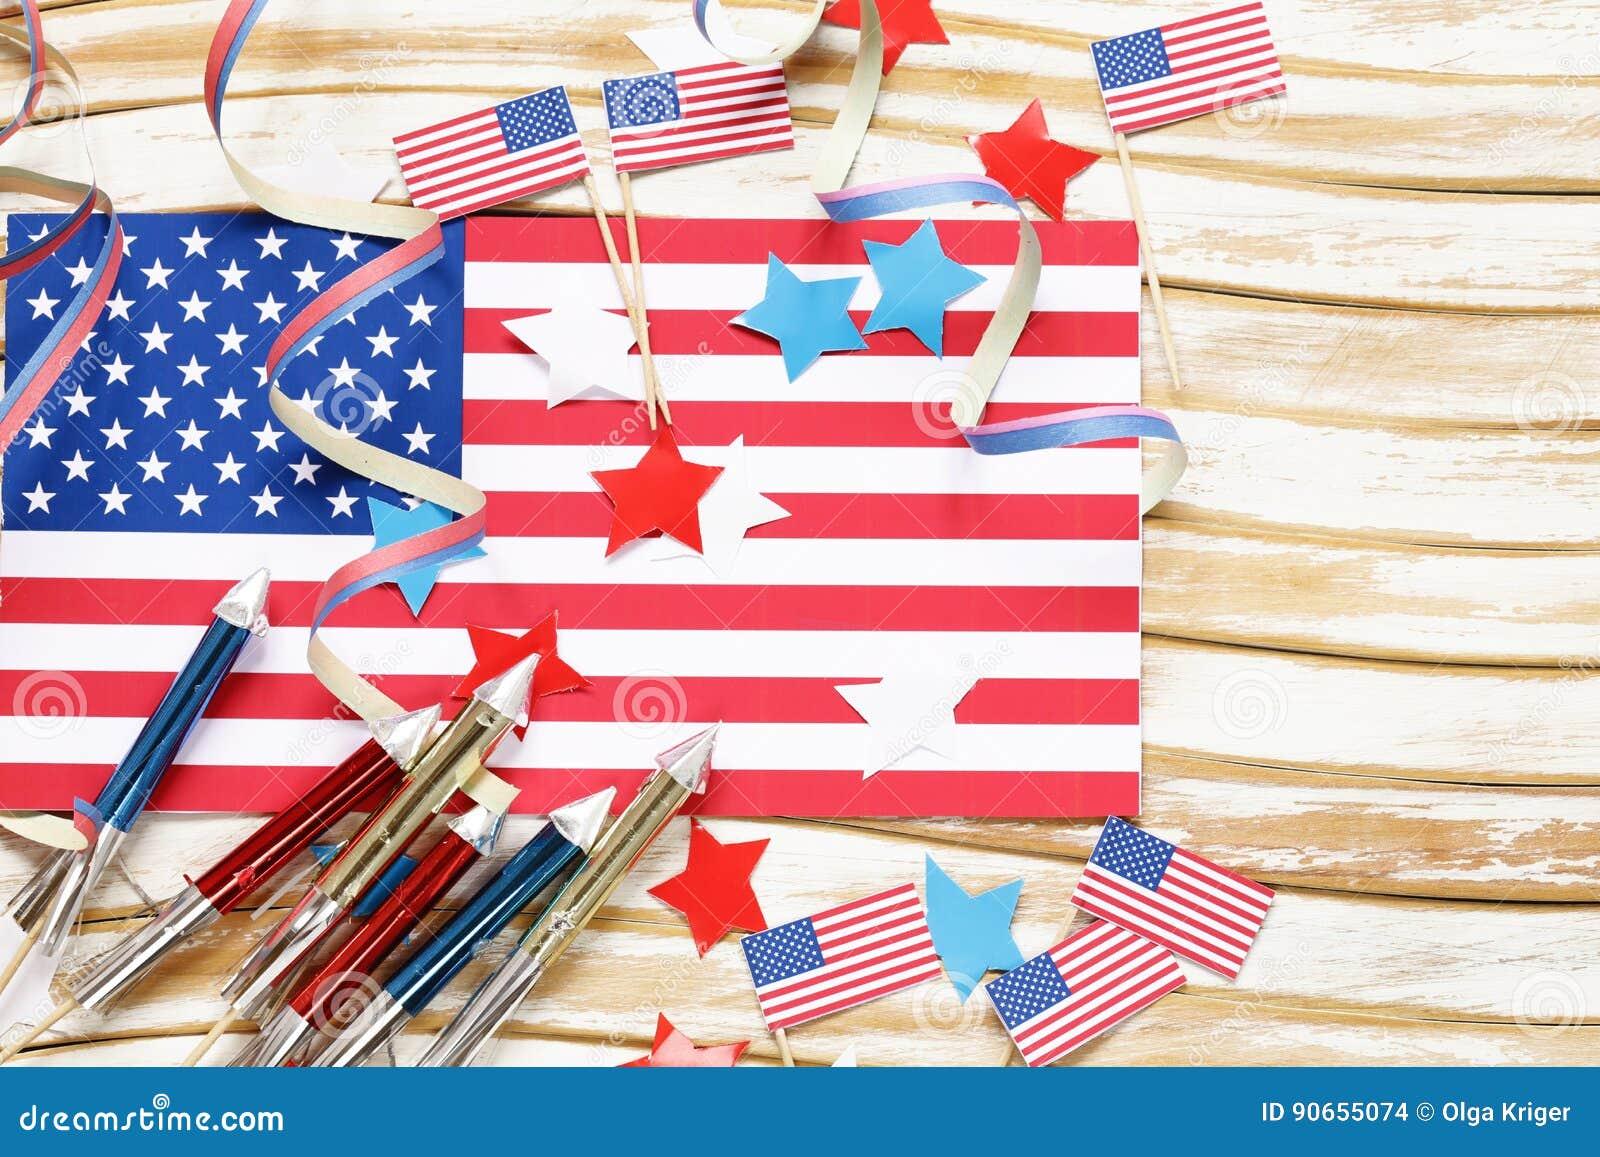 Background With Symbols Of America Celebration Of July 4 Stock